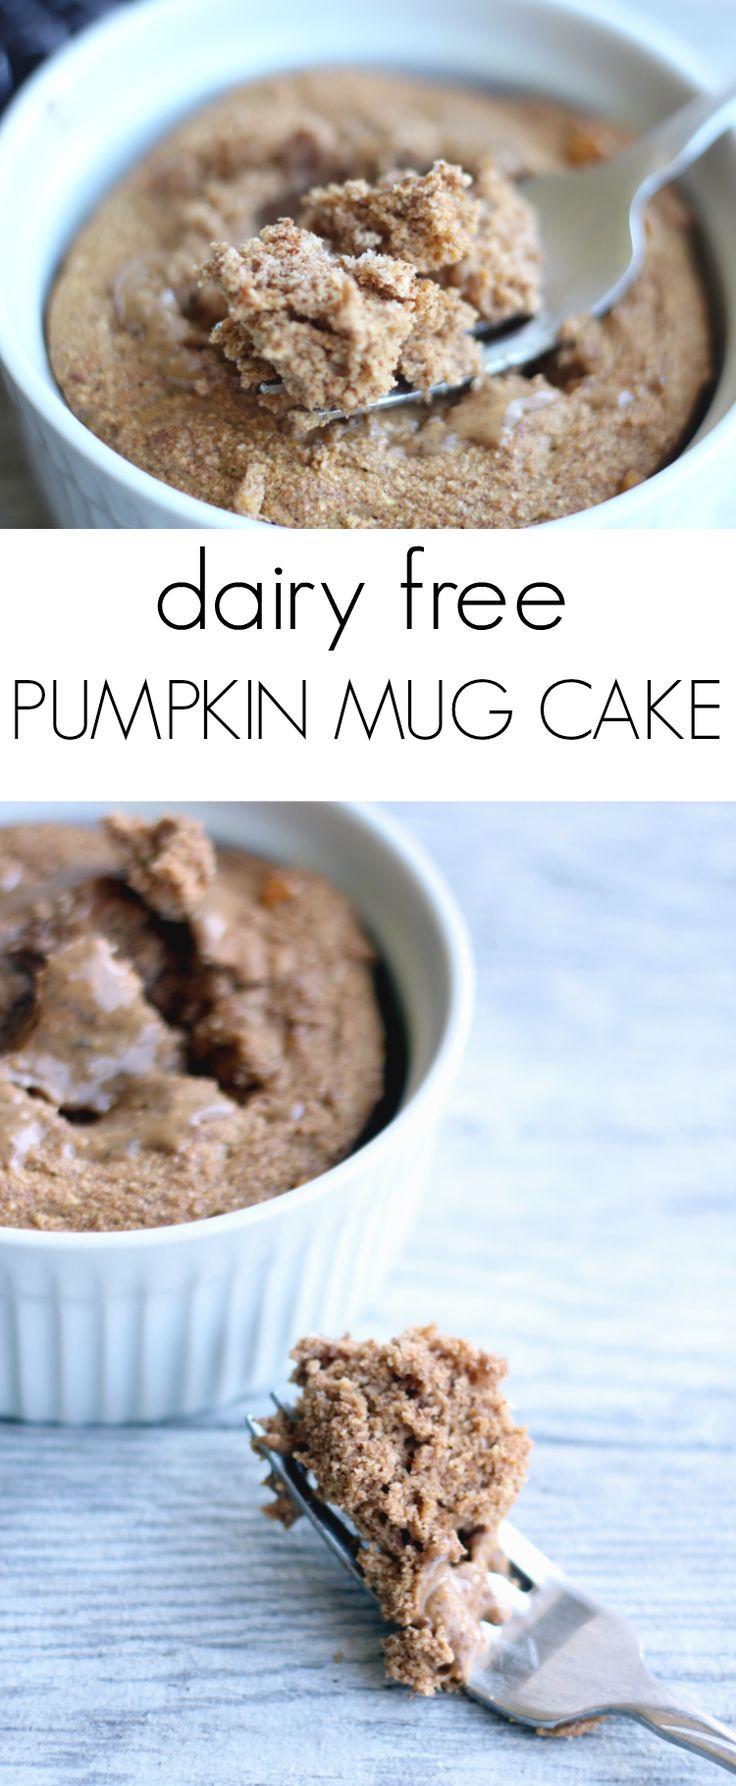 Dairy Free Mug Cake  Dairy Free Pumpkin Mug Cake Recipe